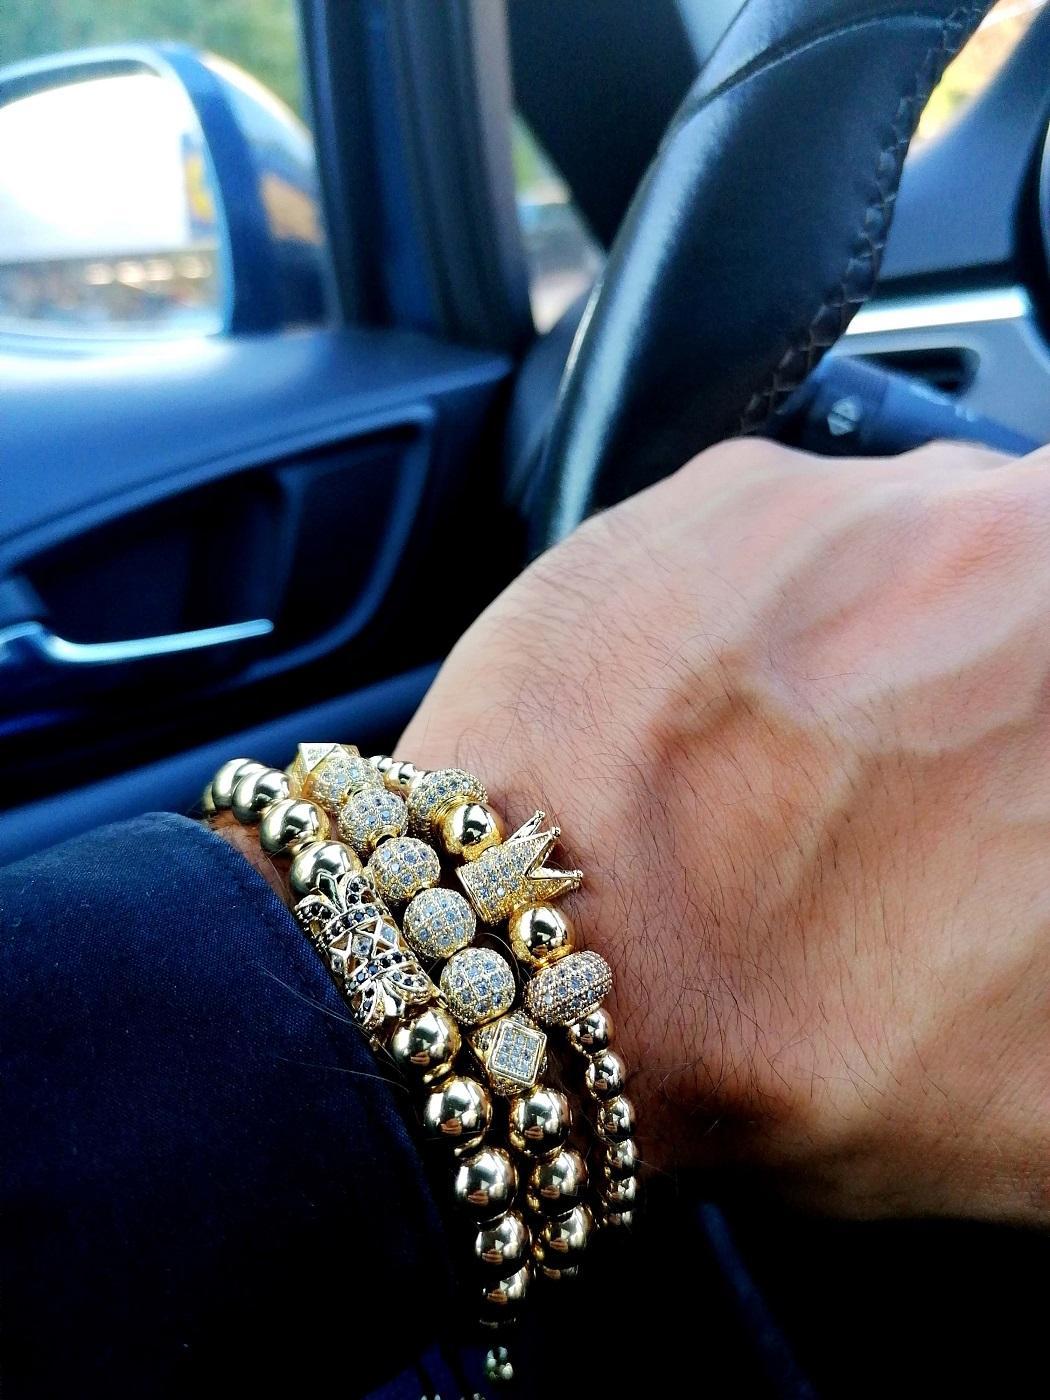 New York, Los Angeles, Chicago, Houston, Phoenix, Philadelphia, San Antonio, San Diego, Dallas, San Jose, Austin, Jacksonville, Fort Worth, Columbus, Charlotte, San Francisco, Indianapolis, Seattle, Denver, Washington, King And Queen Bracelets, Guy Bracelets, Best Mens Bracelets, Mens Metal Bracelet, Men's Jewelry Bracelets, Mens Bangle Bracelet, Mens Braided Bracelet, Mens String Bracelet, Womens Diamond Tennis Bracelet, Real Diamond Bracelet Womens Los Angeles